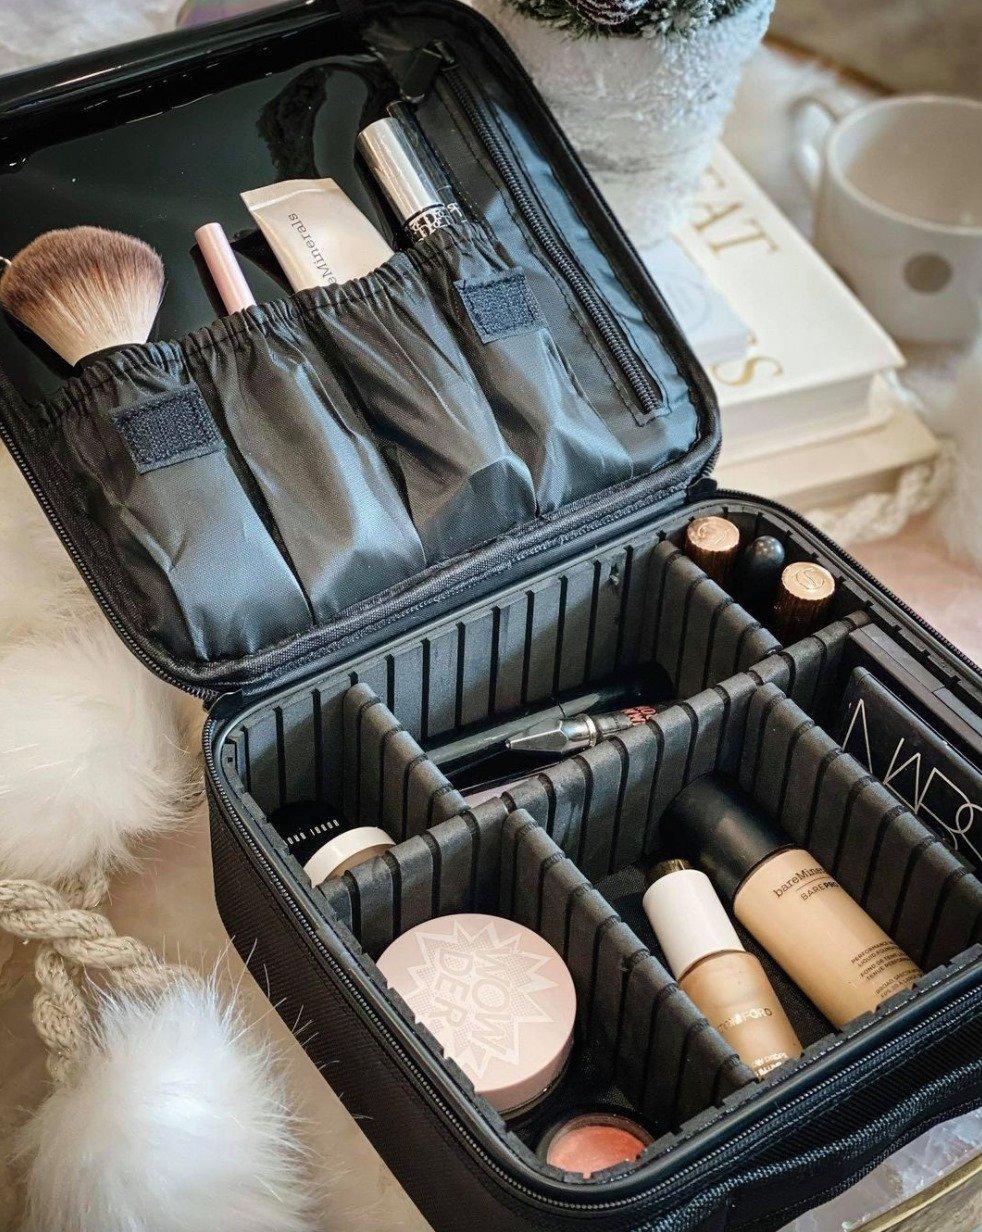 the motherchic amazon beauty travel case